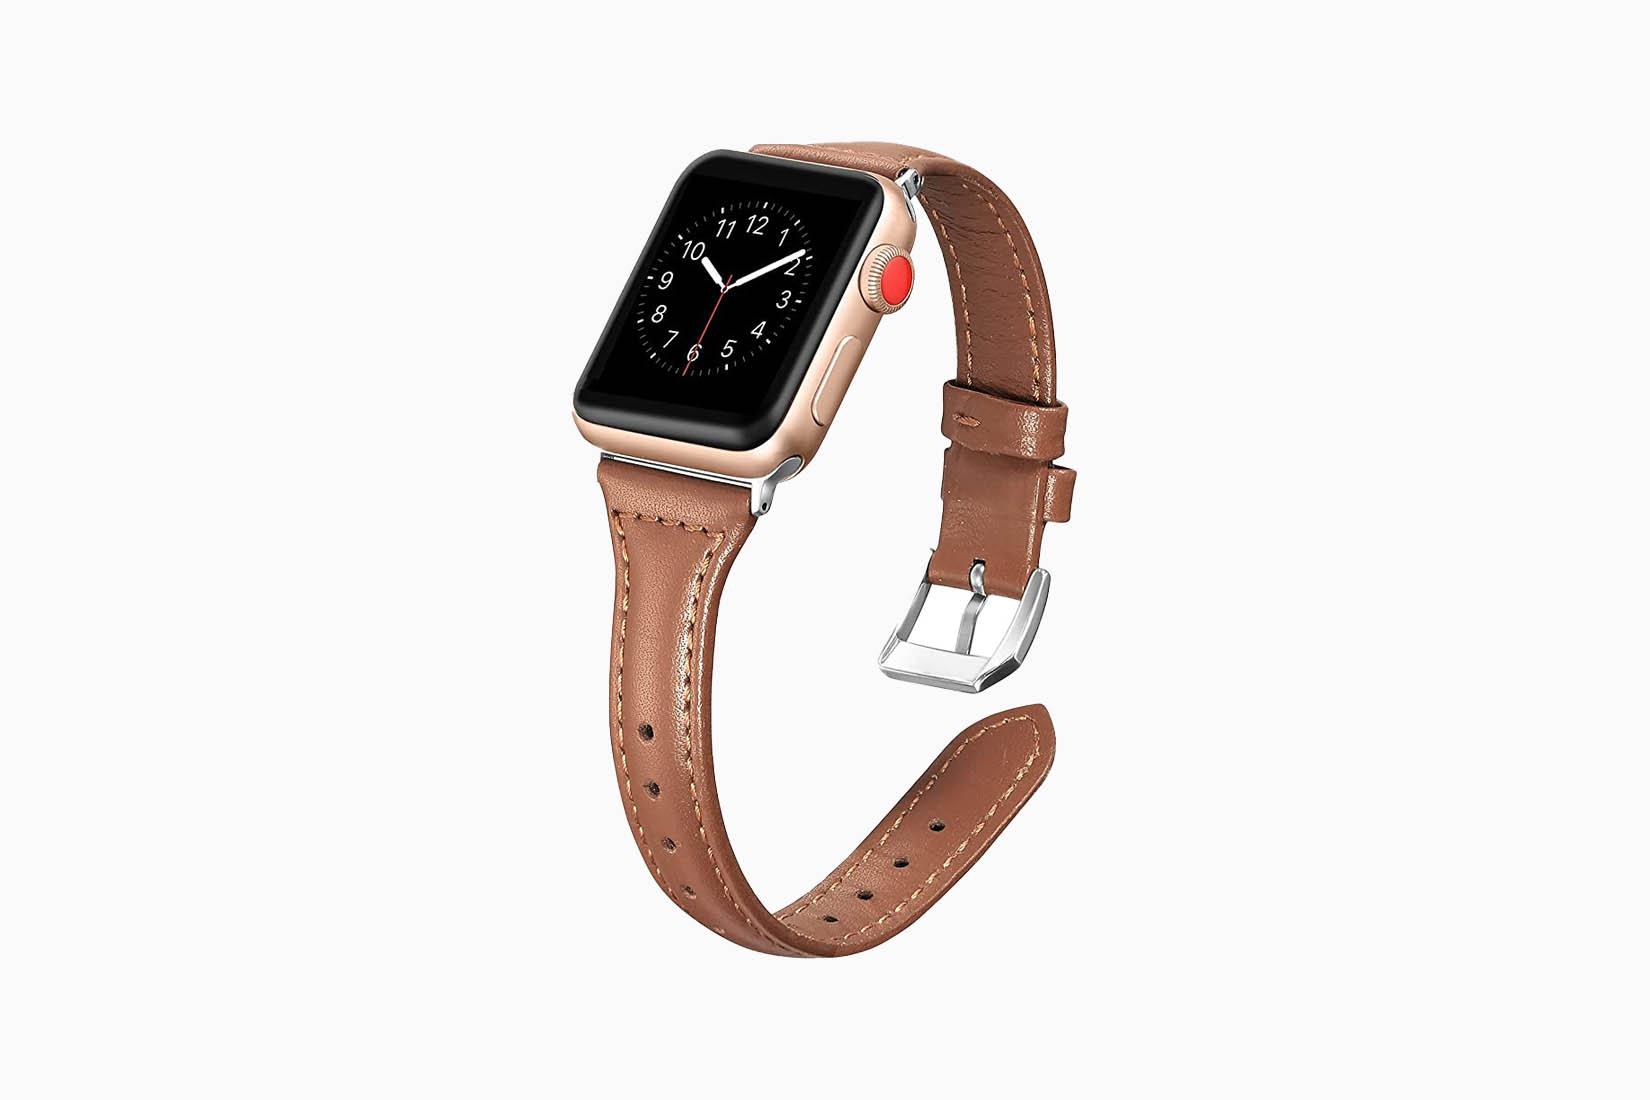 best apple watch bands secbolt review Luxe Digital